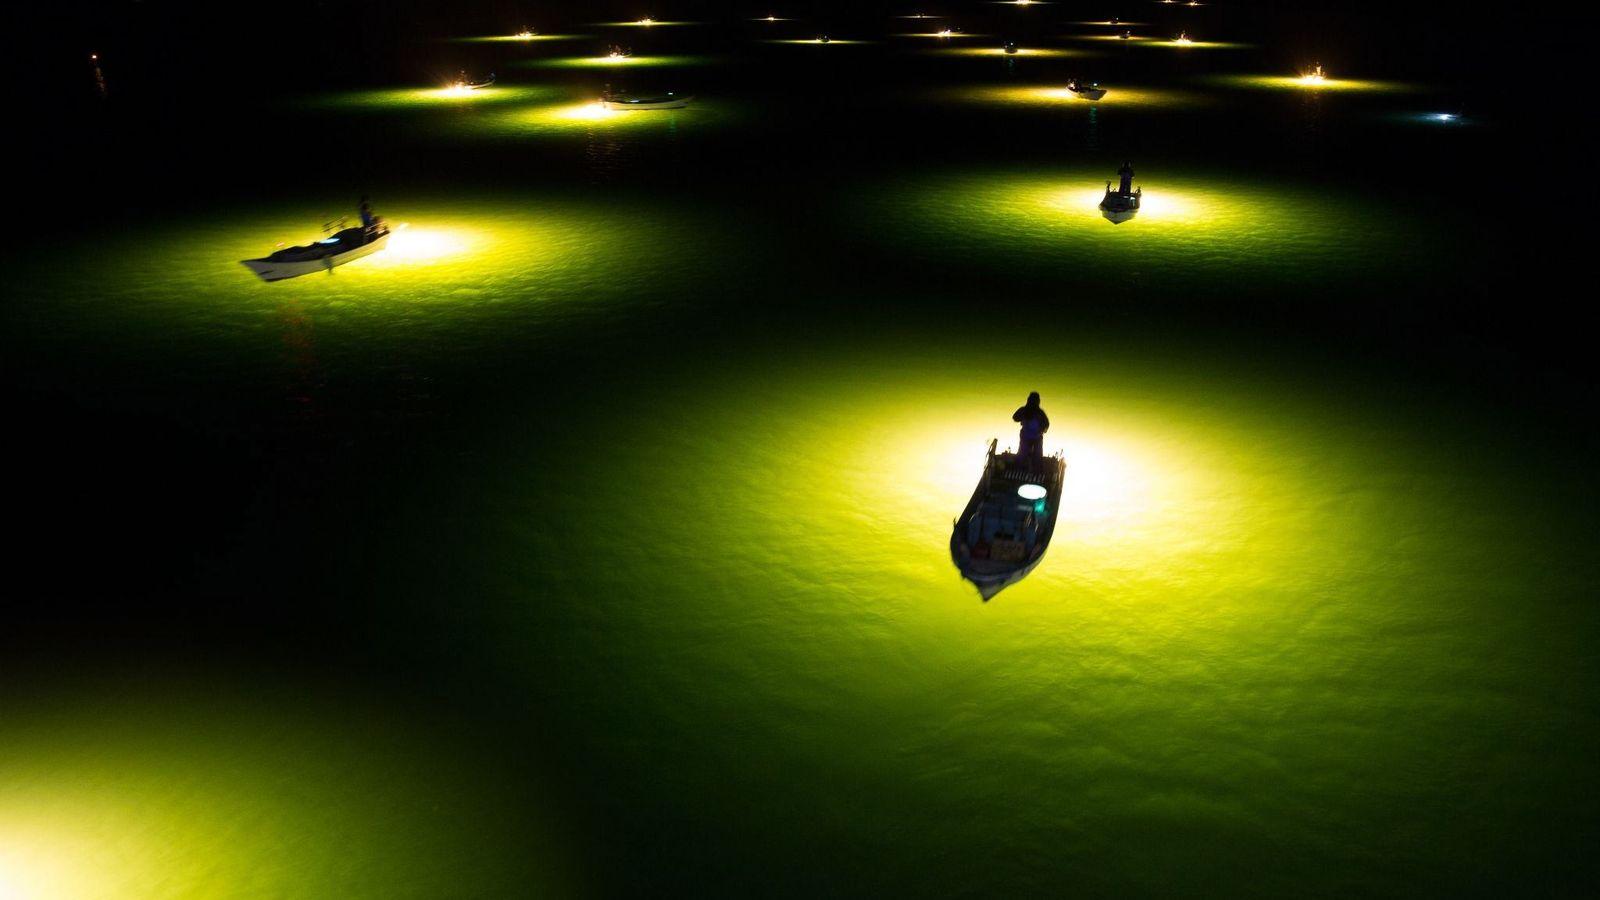 Guiadas por la luz